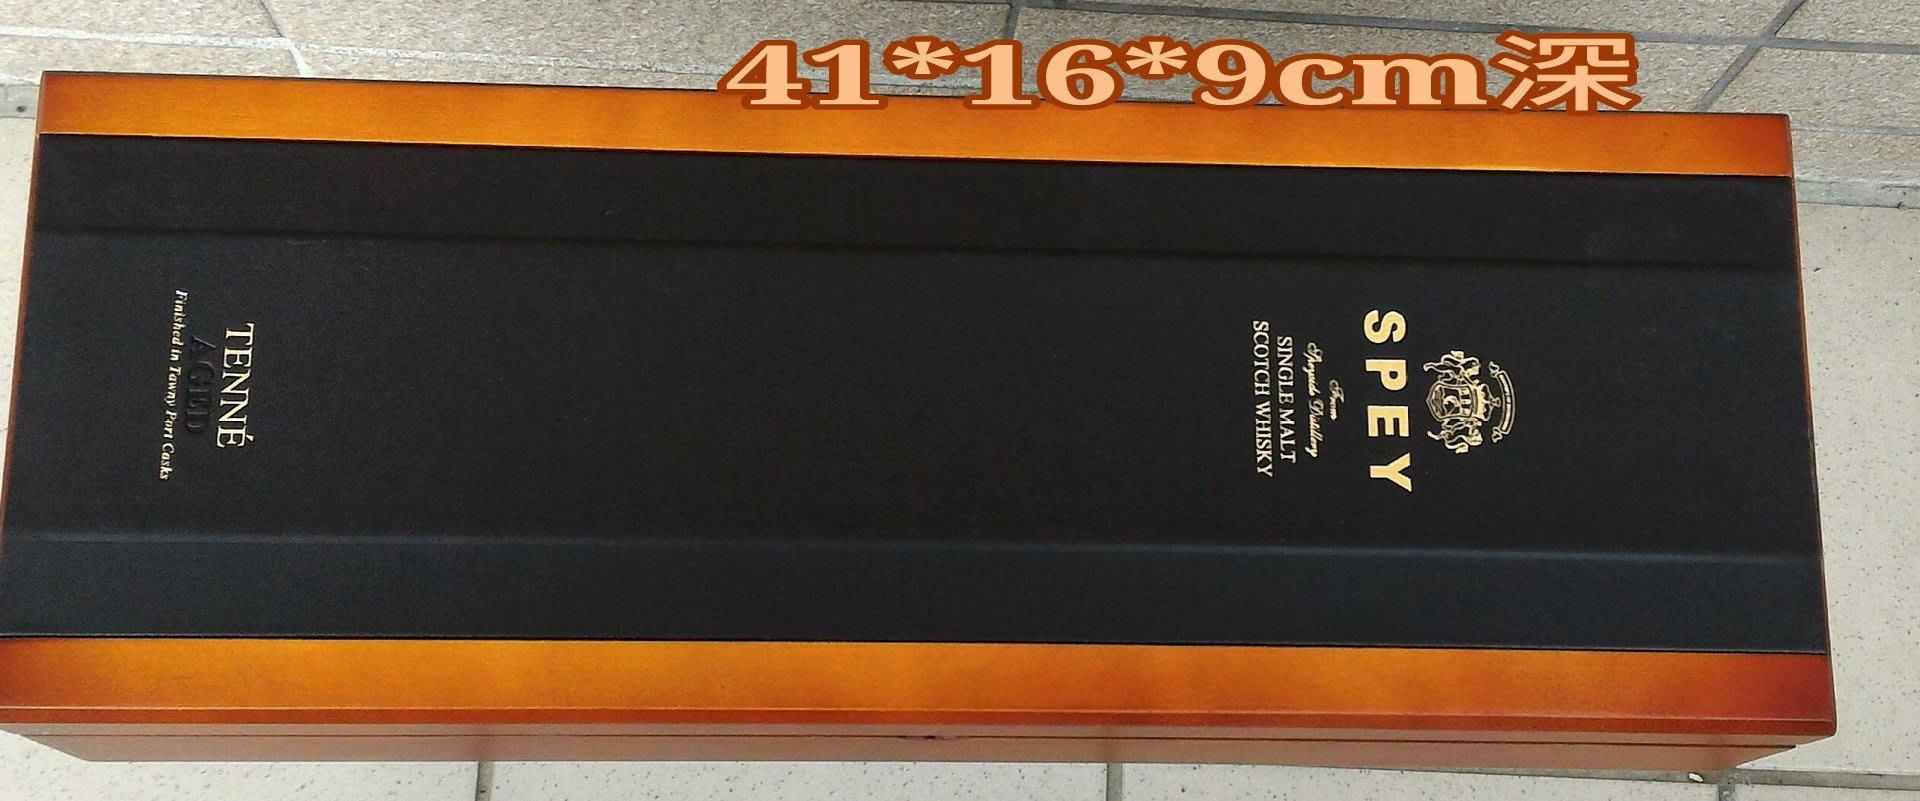 Spey木質長方盒長條珠寶盒金條收納盒子41cm木盒whisky玻璃酒瓶收藏盒304隨身威士忌扁酒壺俄羅斯式小酒壺9oz